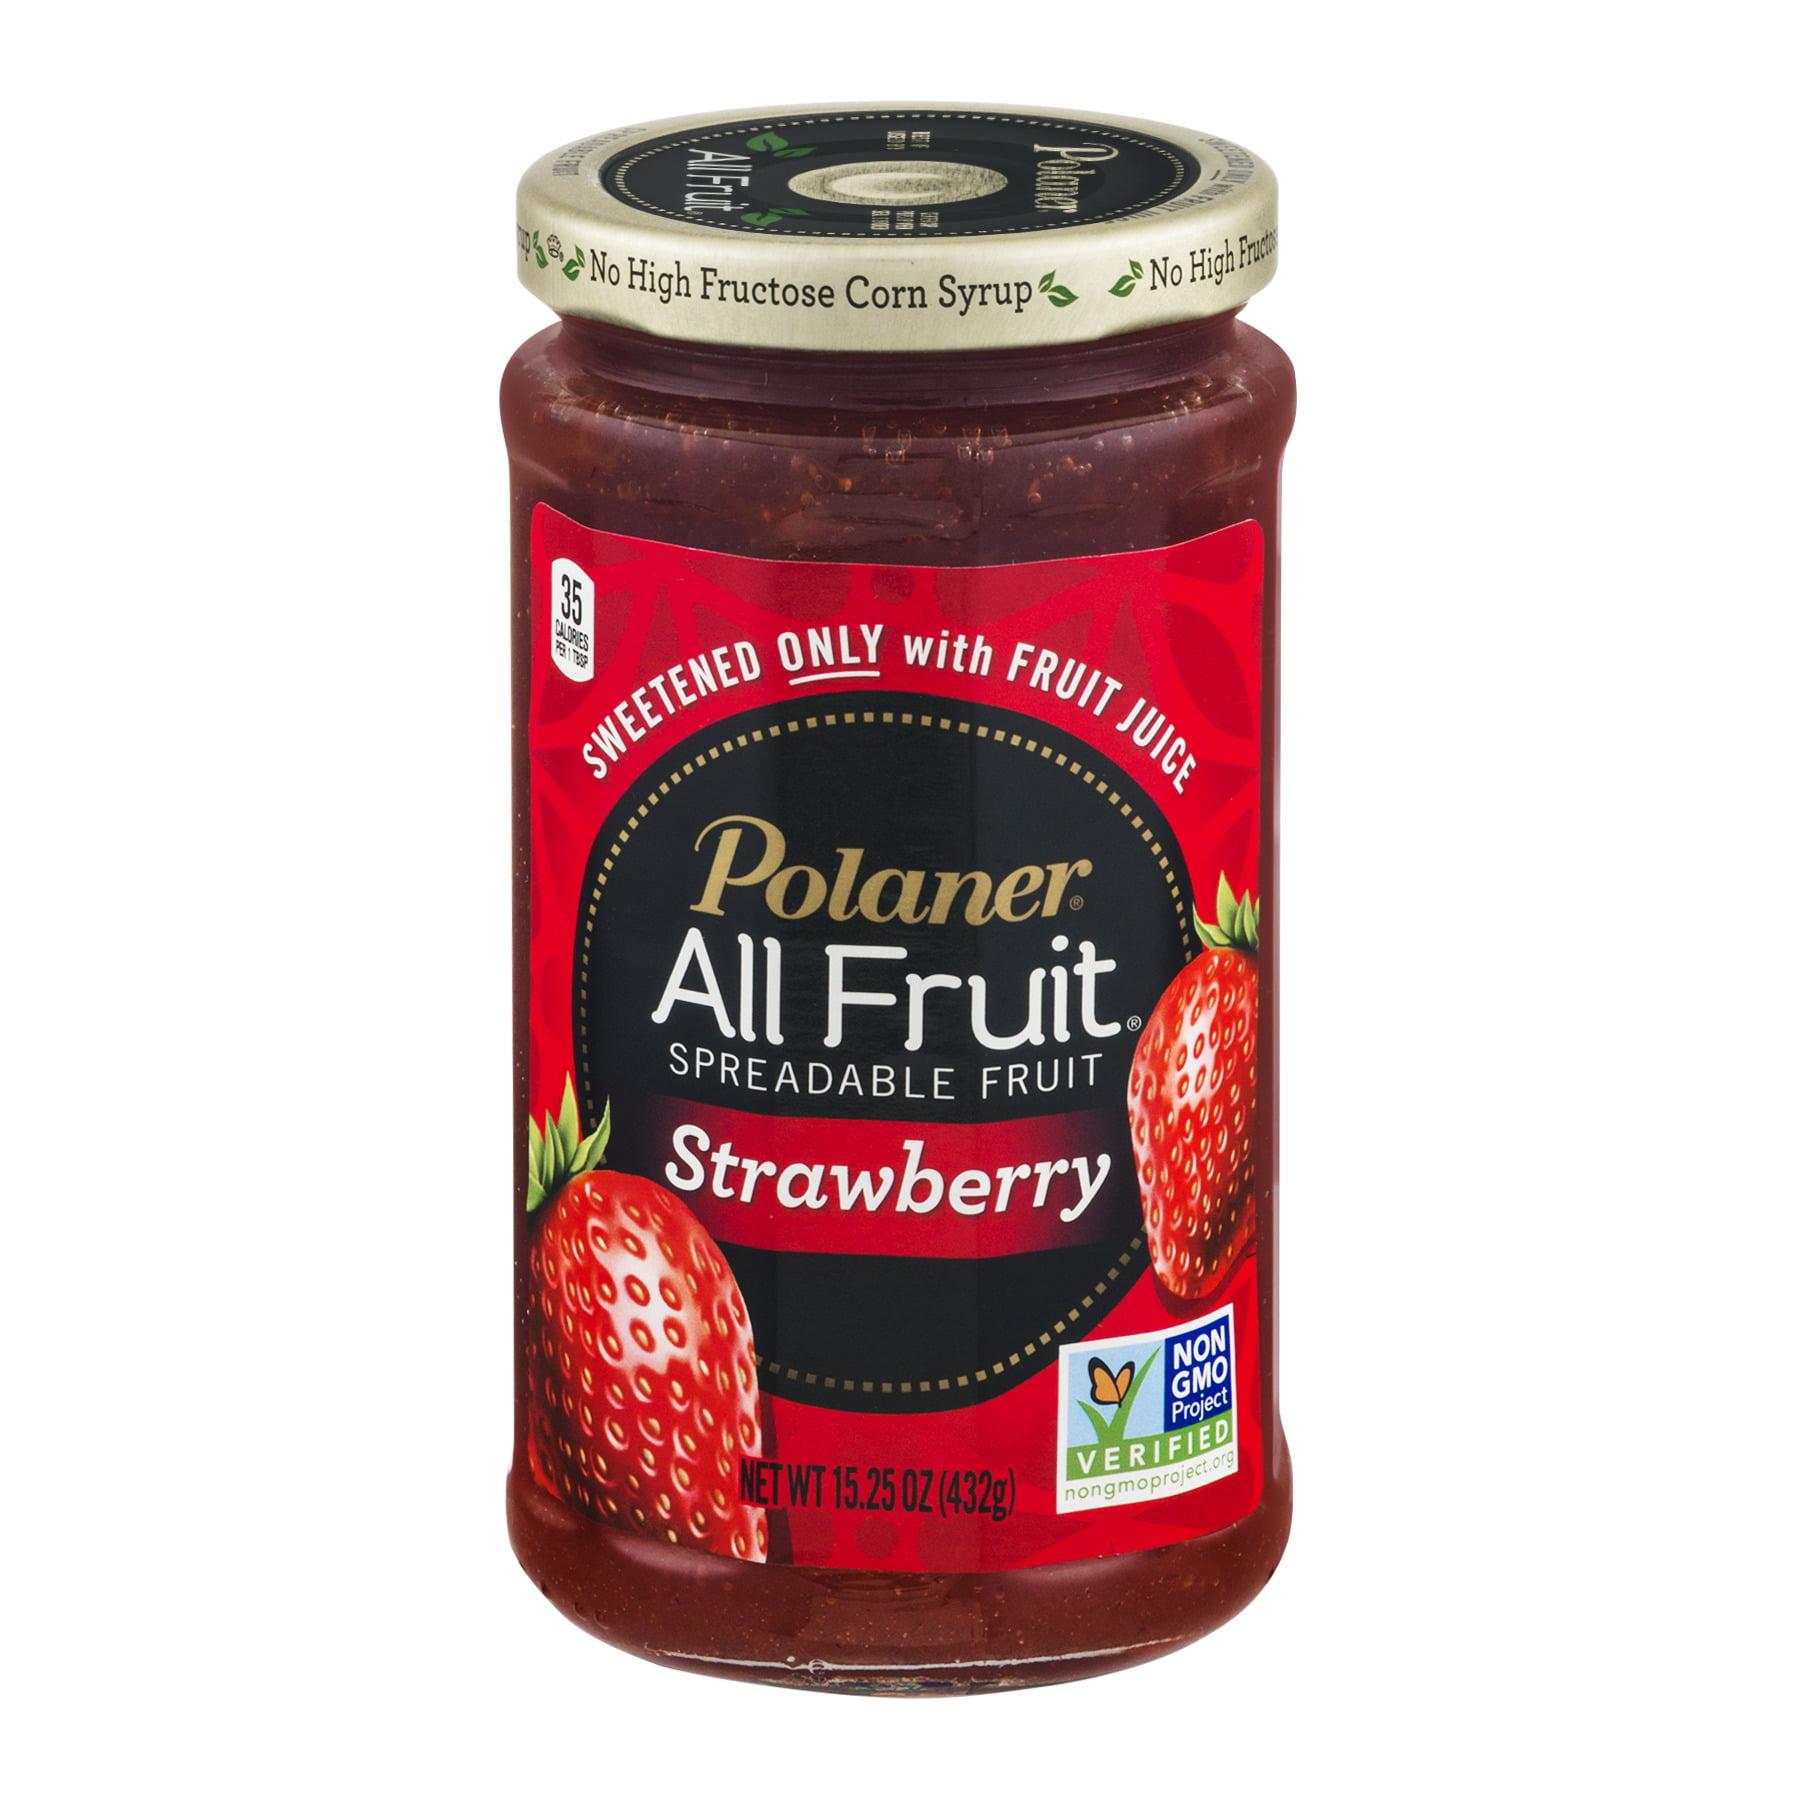 Polaner All Fruit Strawberry Fruit Spread, 15.25 oz